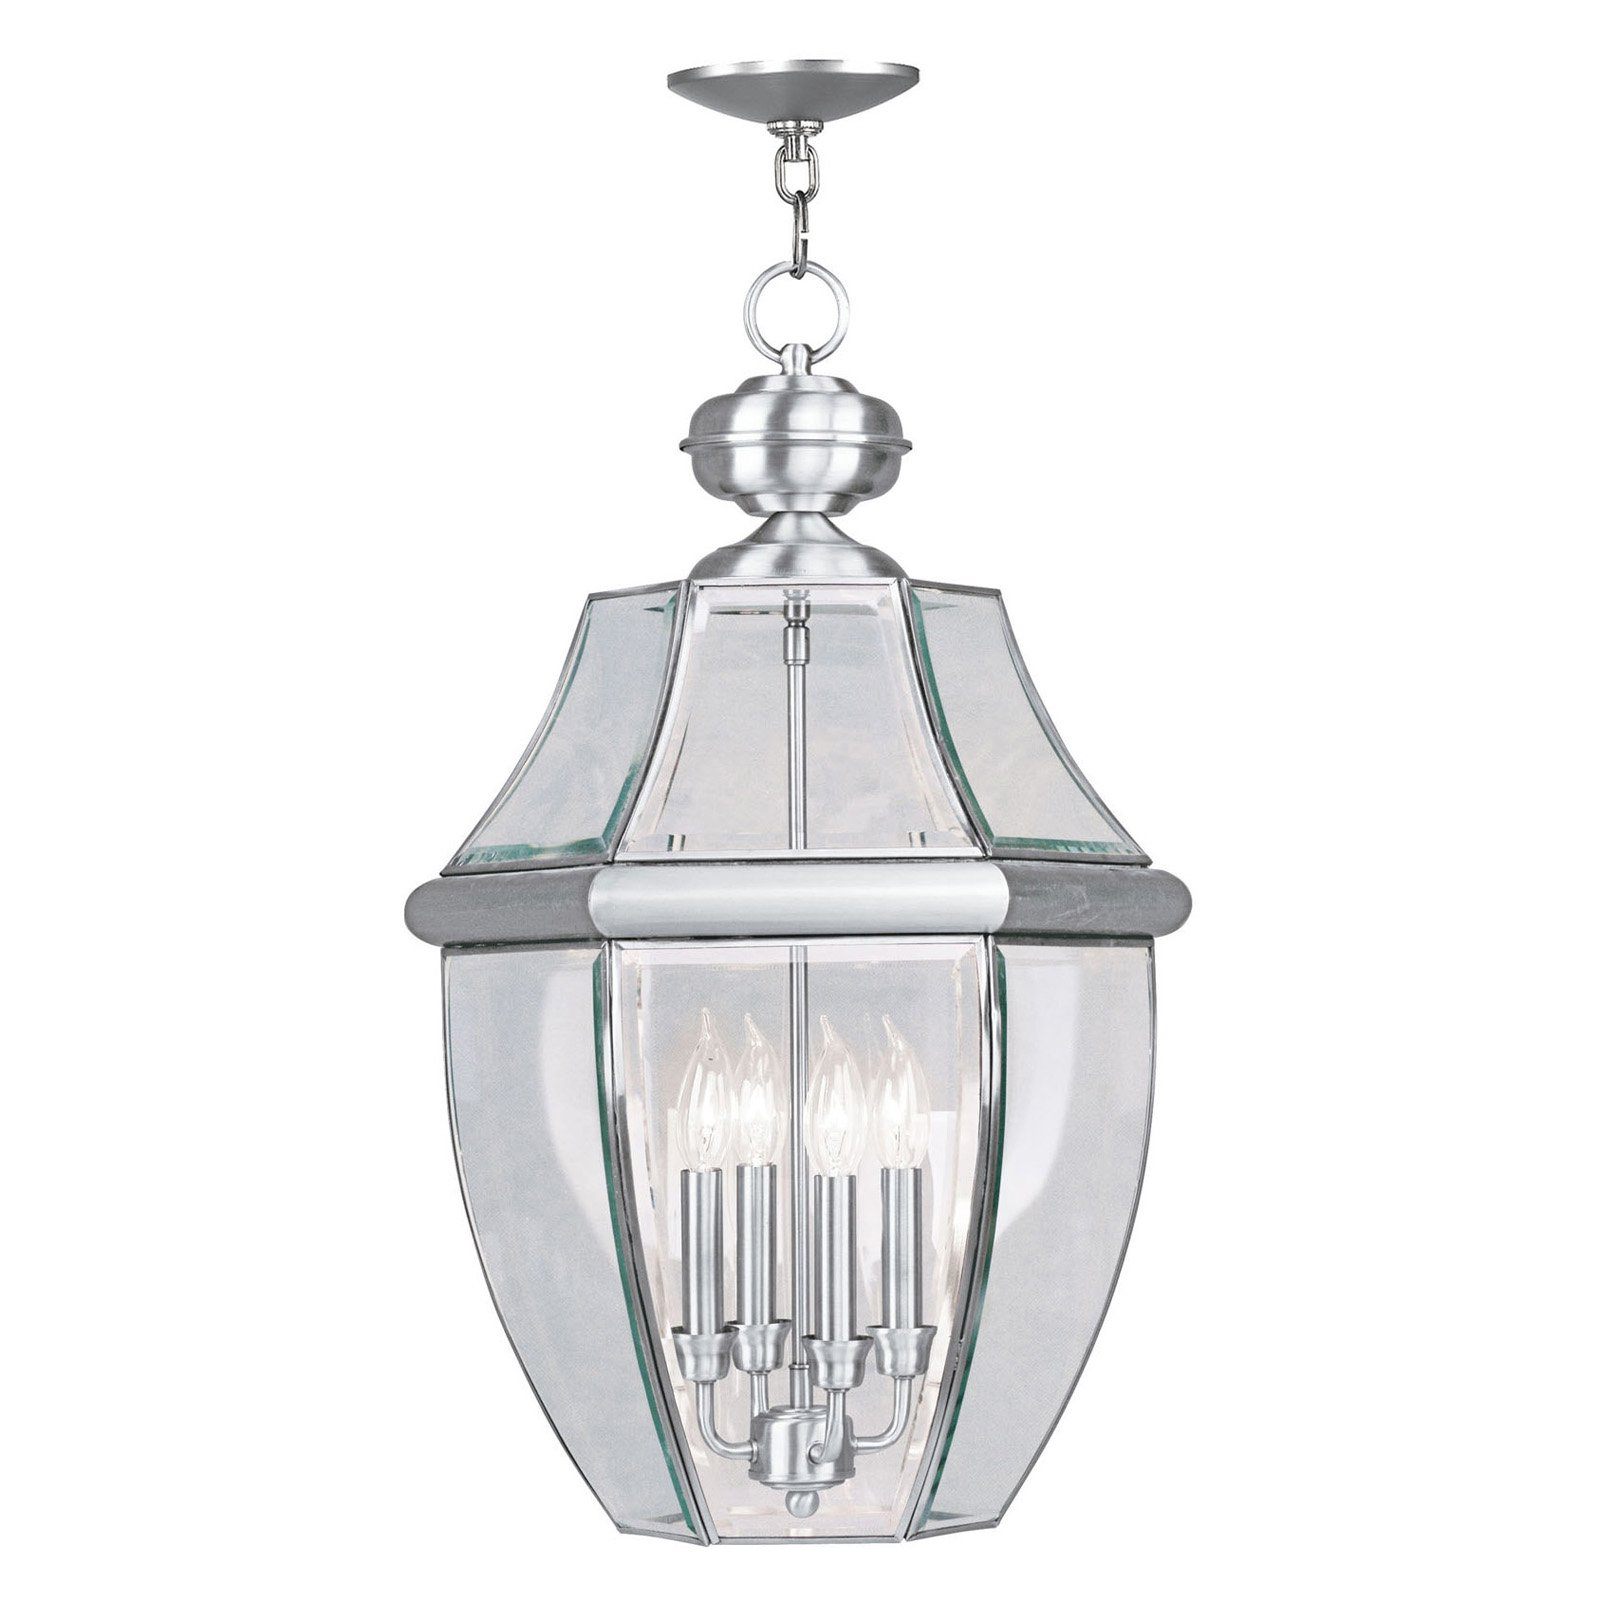 Livex Monterey 2357 Outdoor Hanging Lantern 16 diam. in. by Livex Lighting Inc